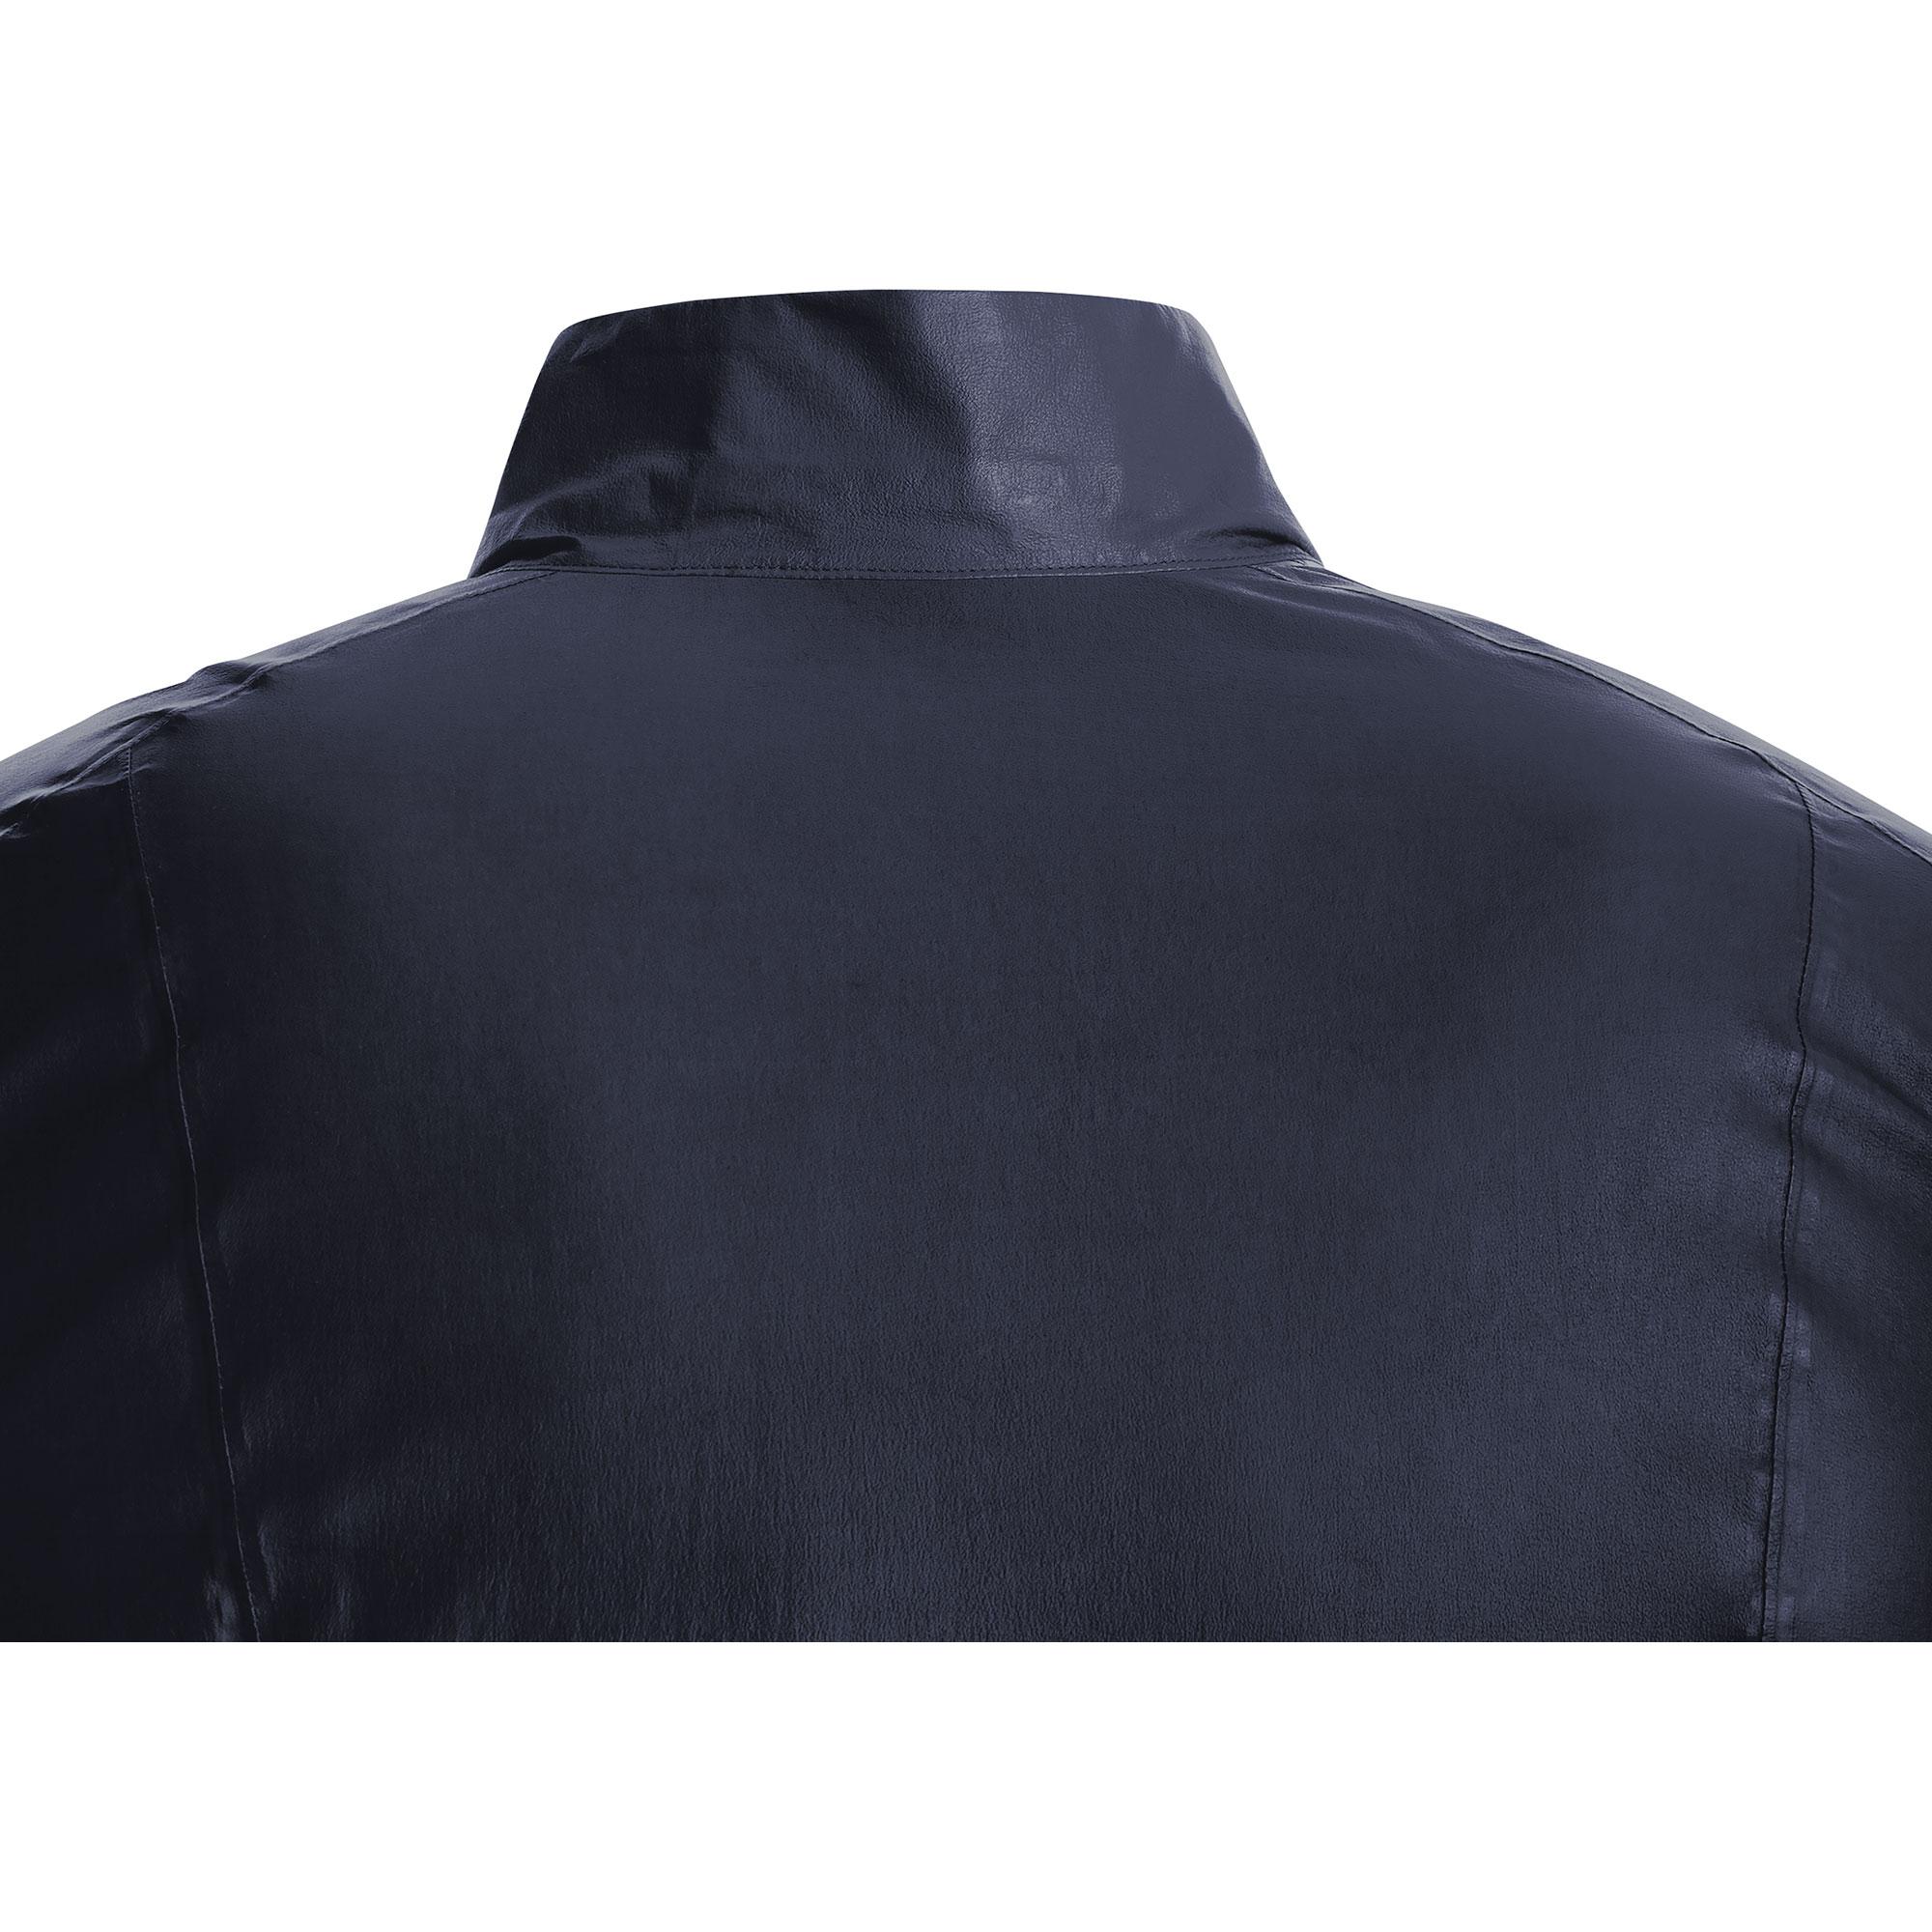 516bd381b C5 GORE-TEX SHAKEDRY 1985 Jacket